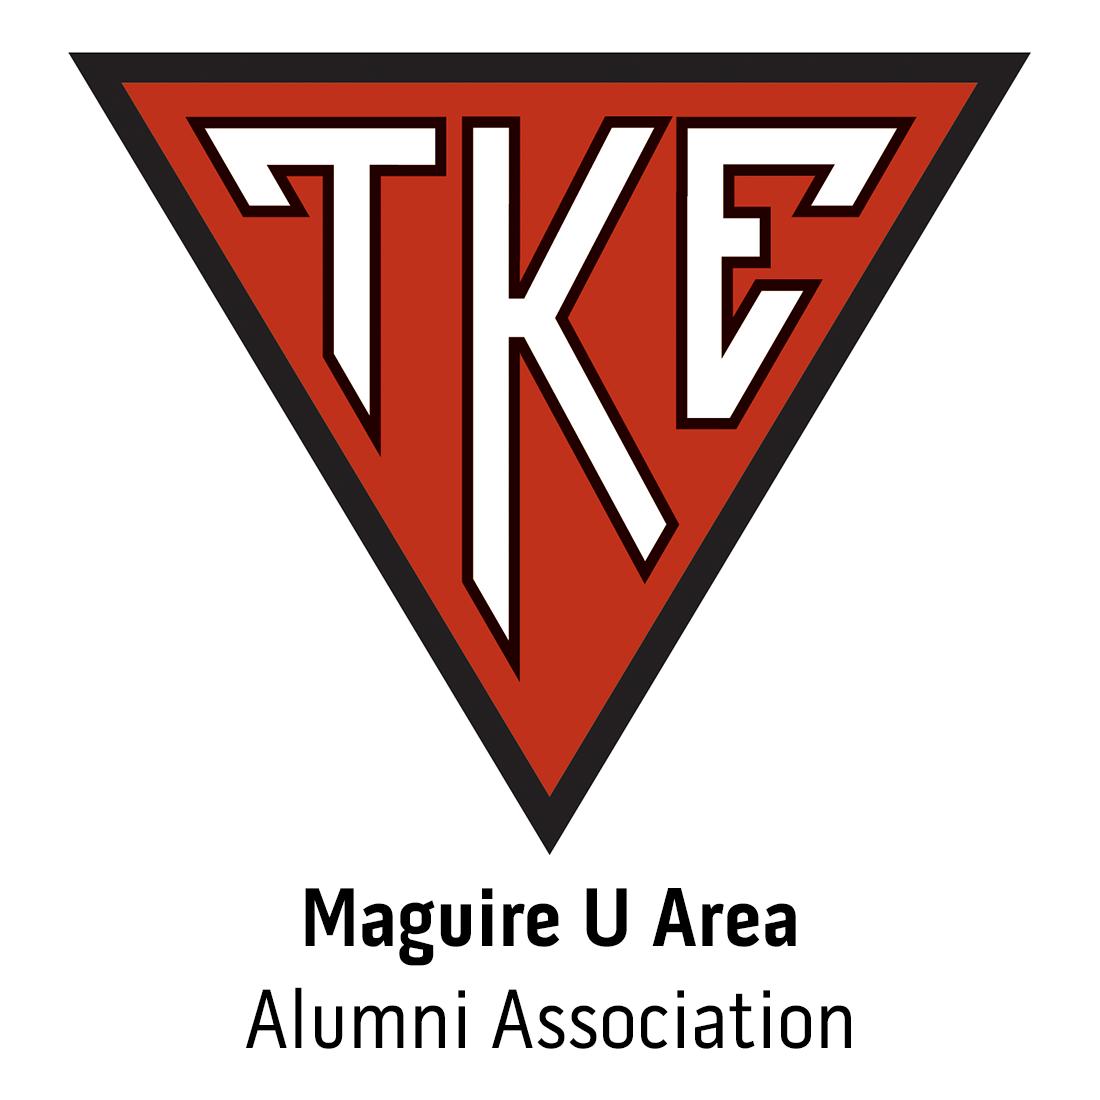 Maguire U Area Alumni Association at Chicago, IL